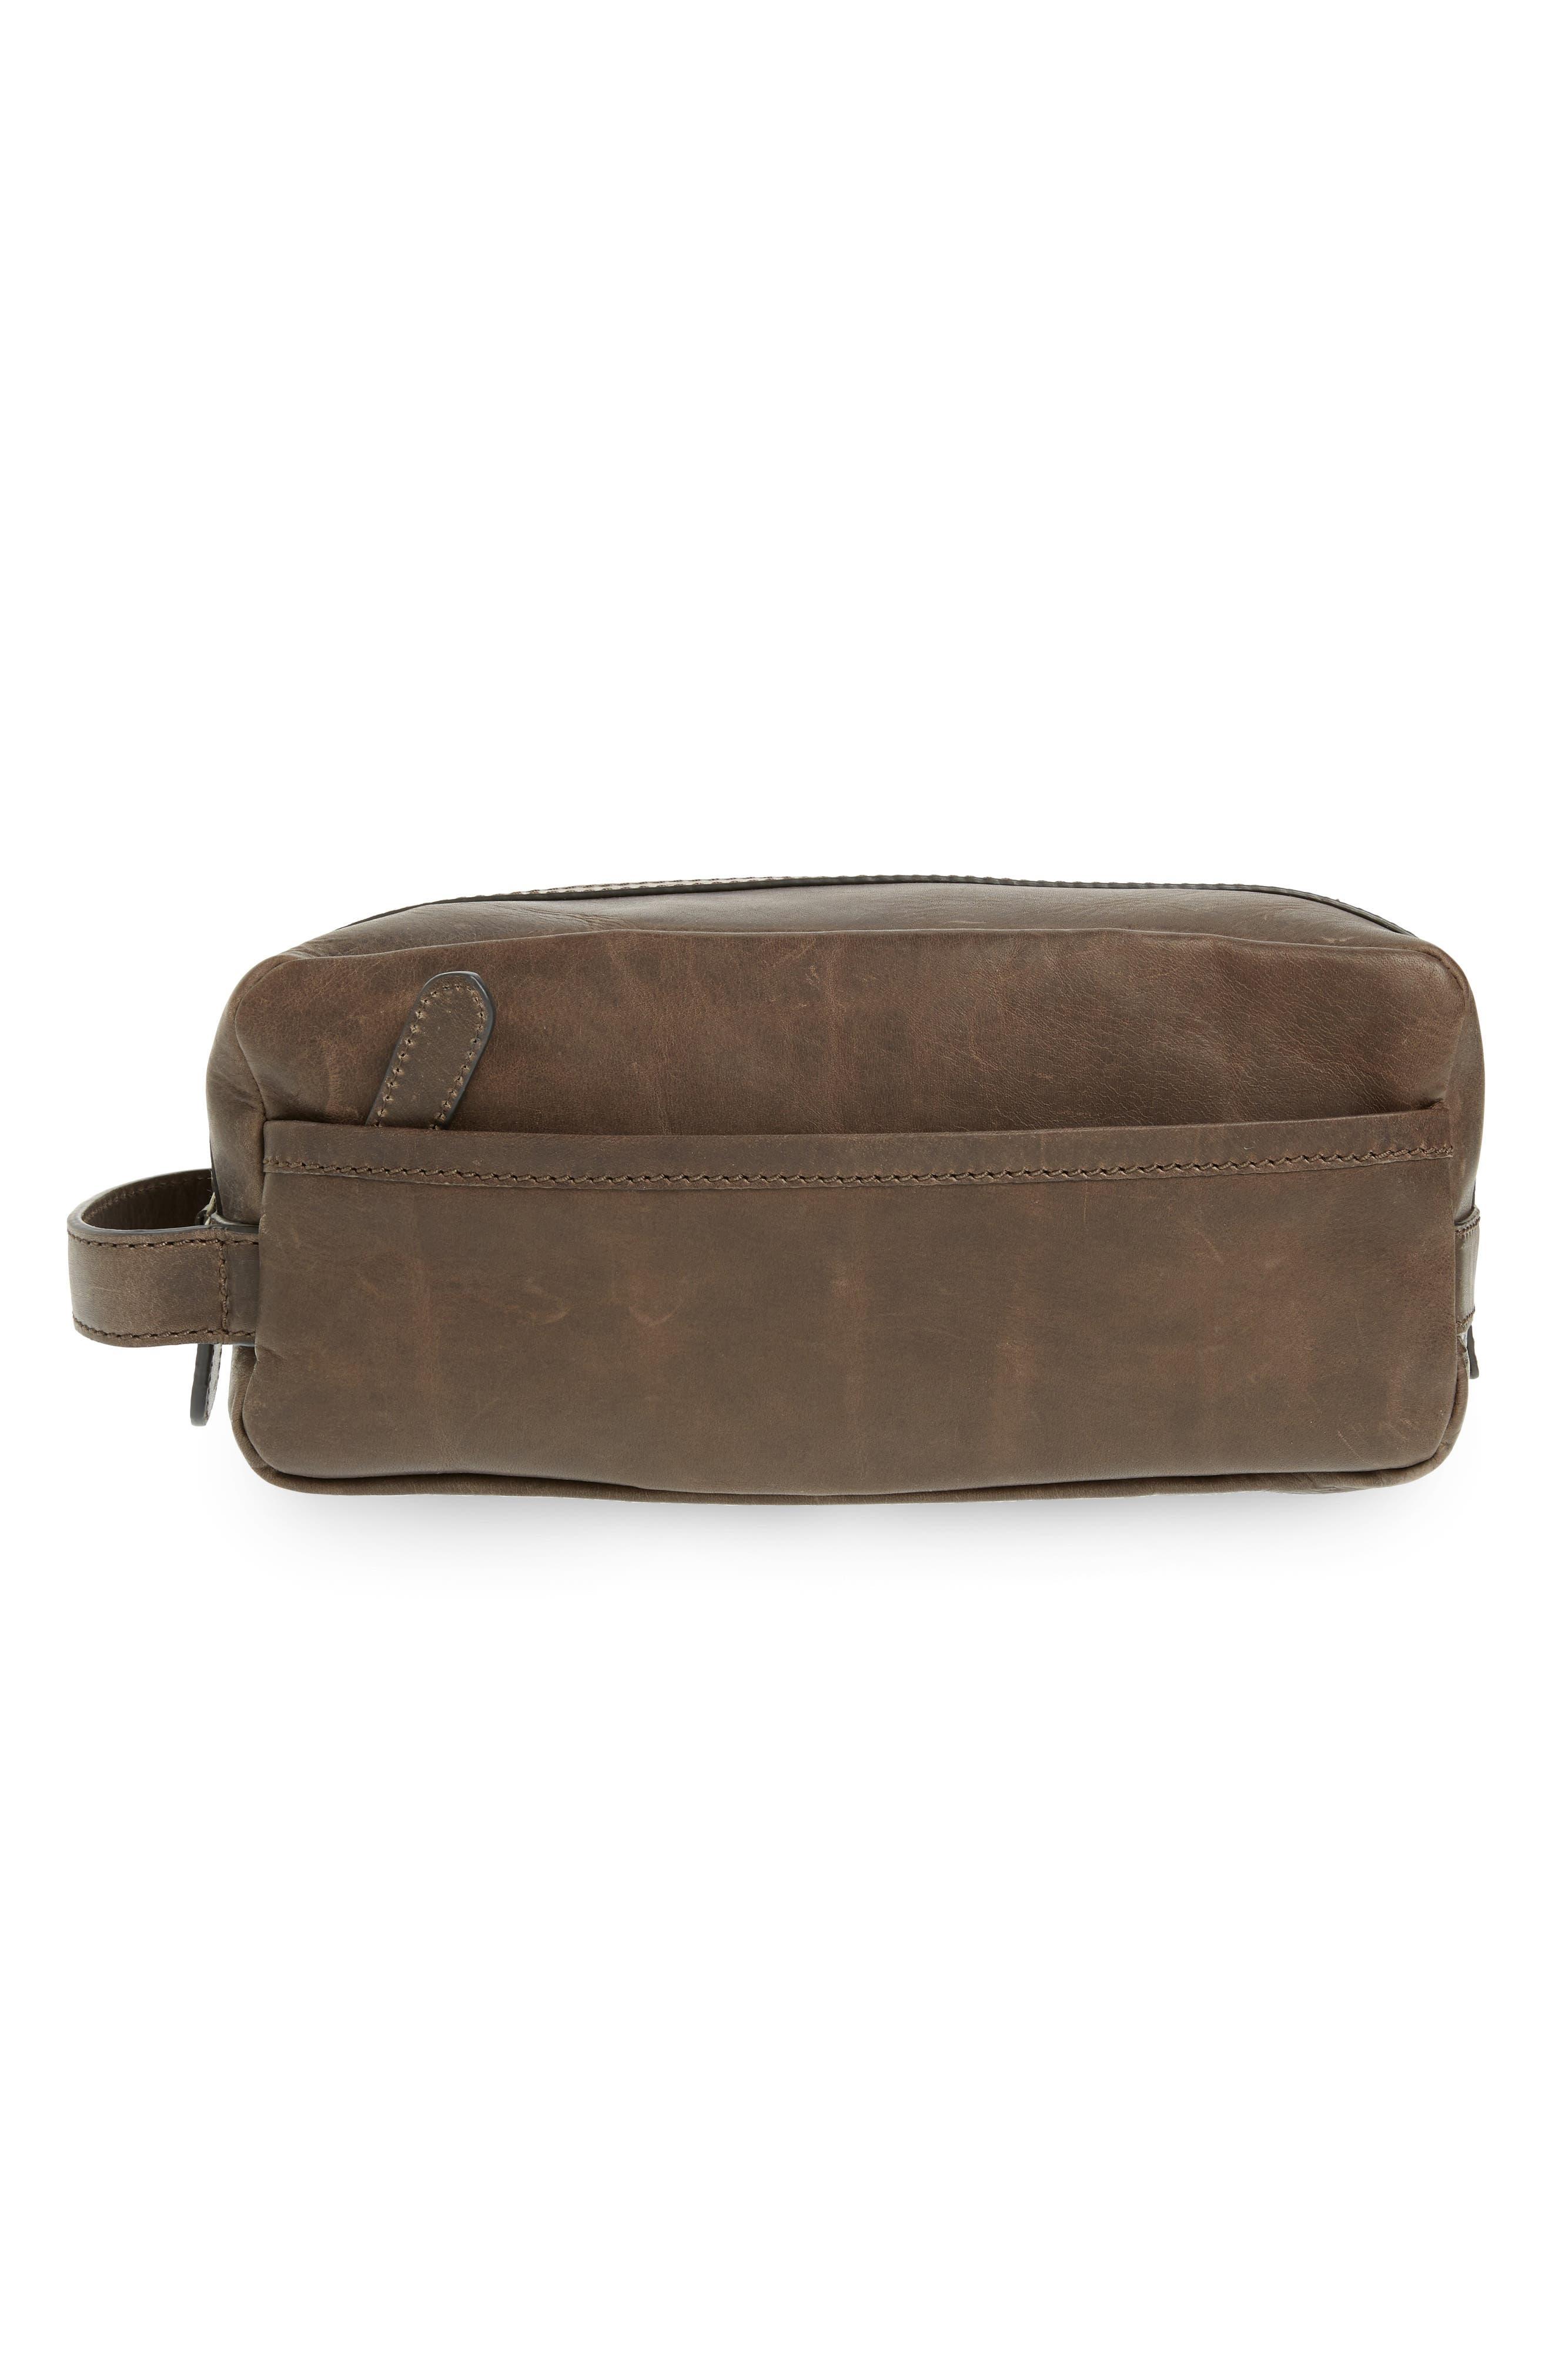 FRYE 'Logan' Leather Travel Kit, Main, color, SLATE